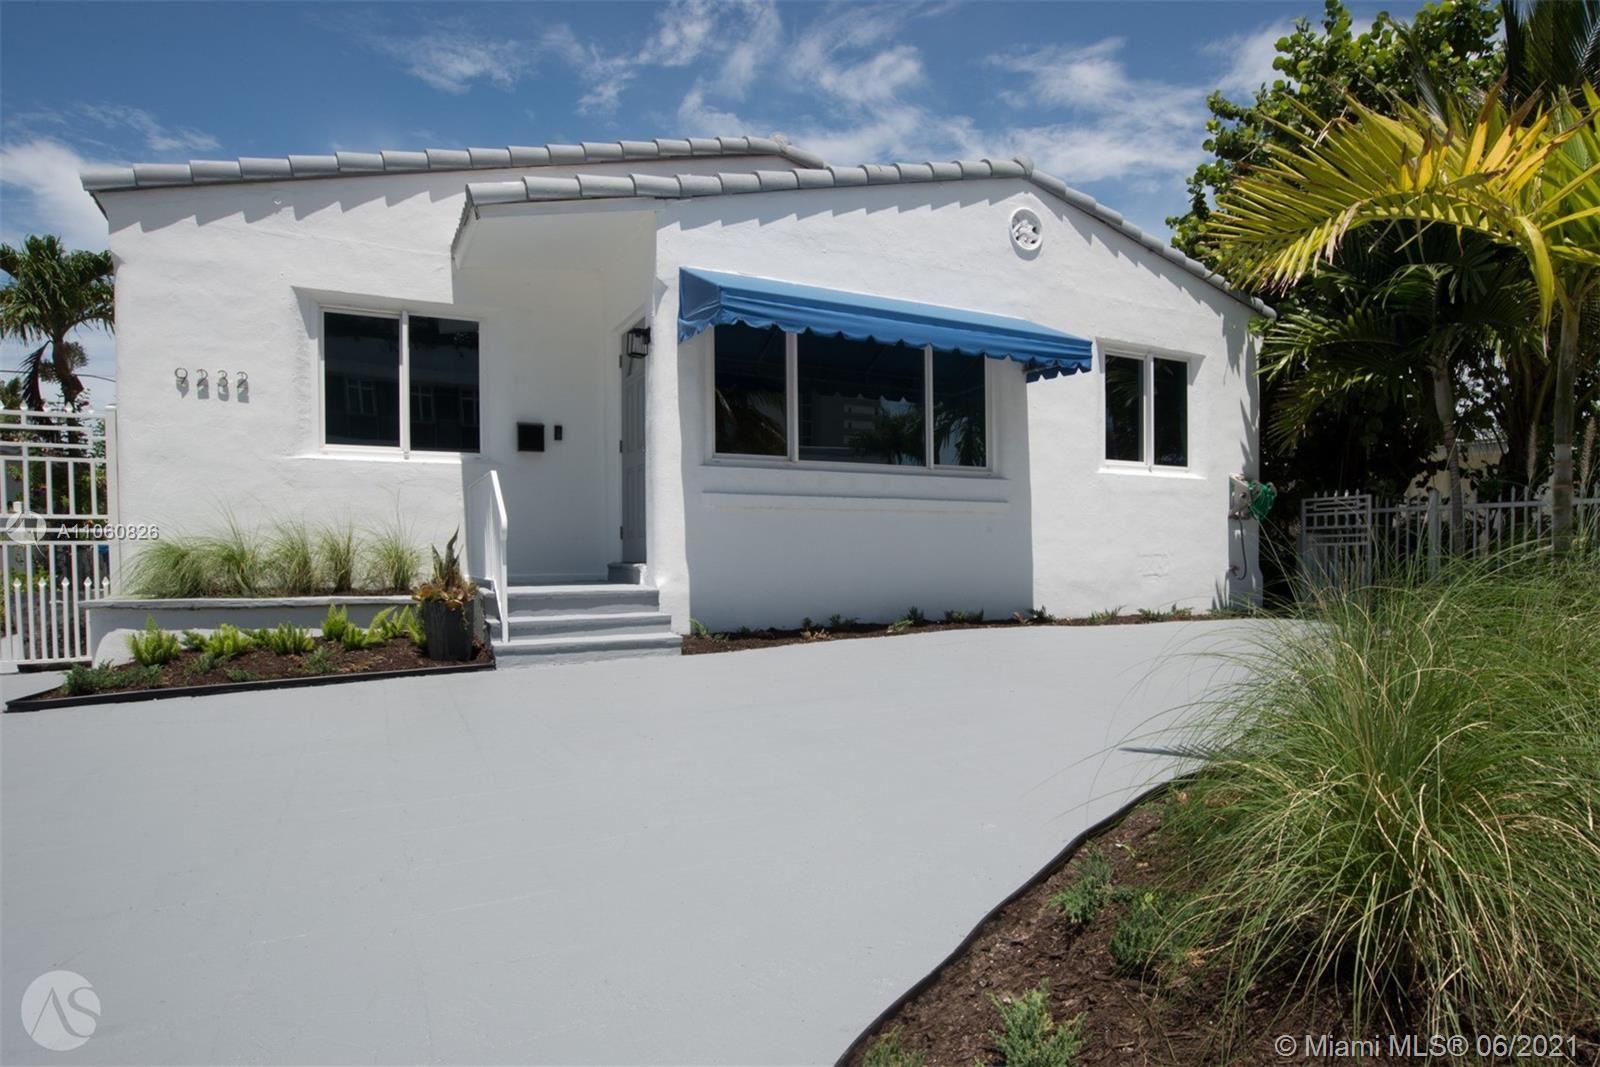 9232 Harding Ave, Surfside, FL 33154 - #: A11060826